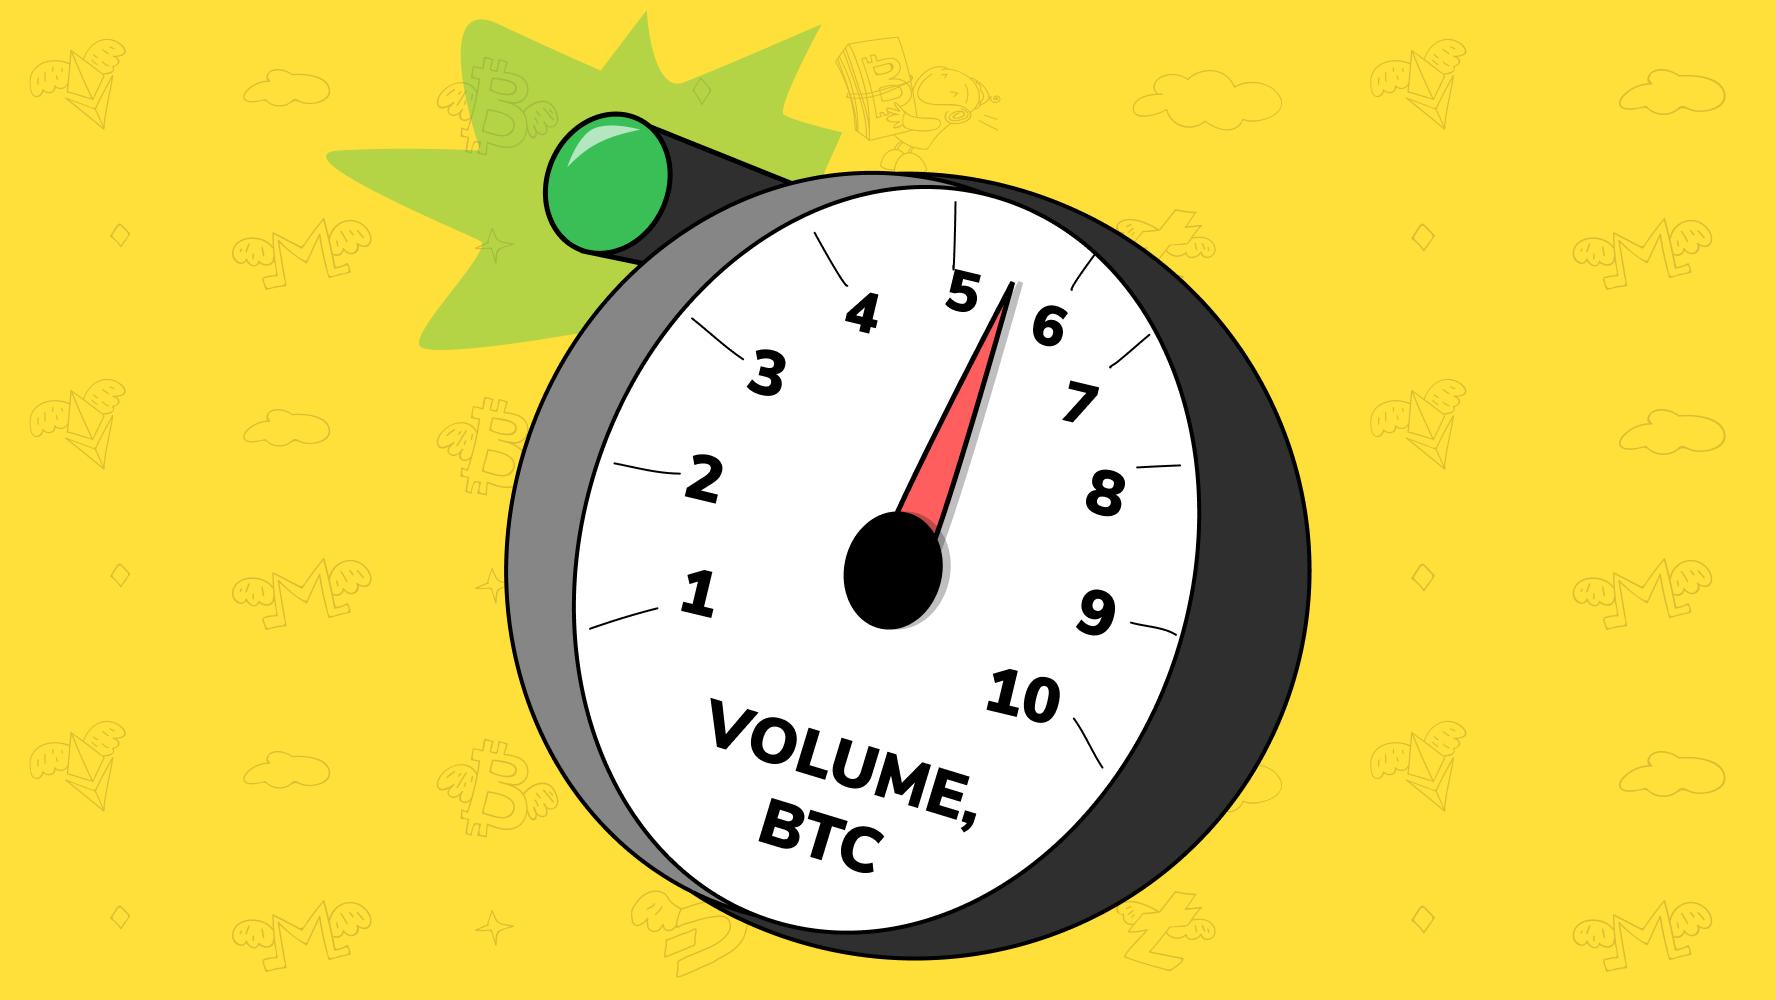 Cryptocurrency Volume Indicators: On Balance Volume, Money